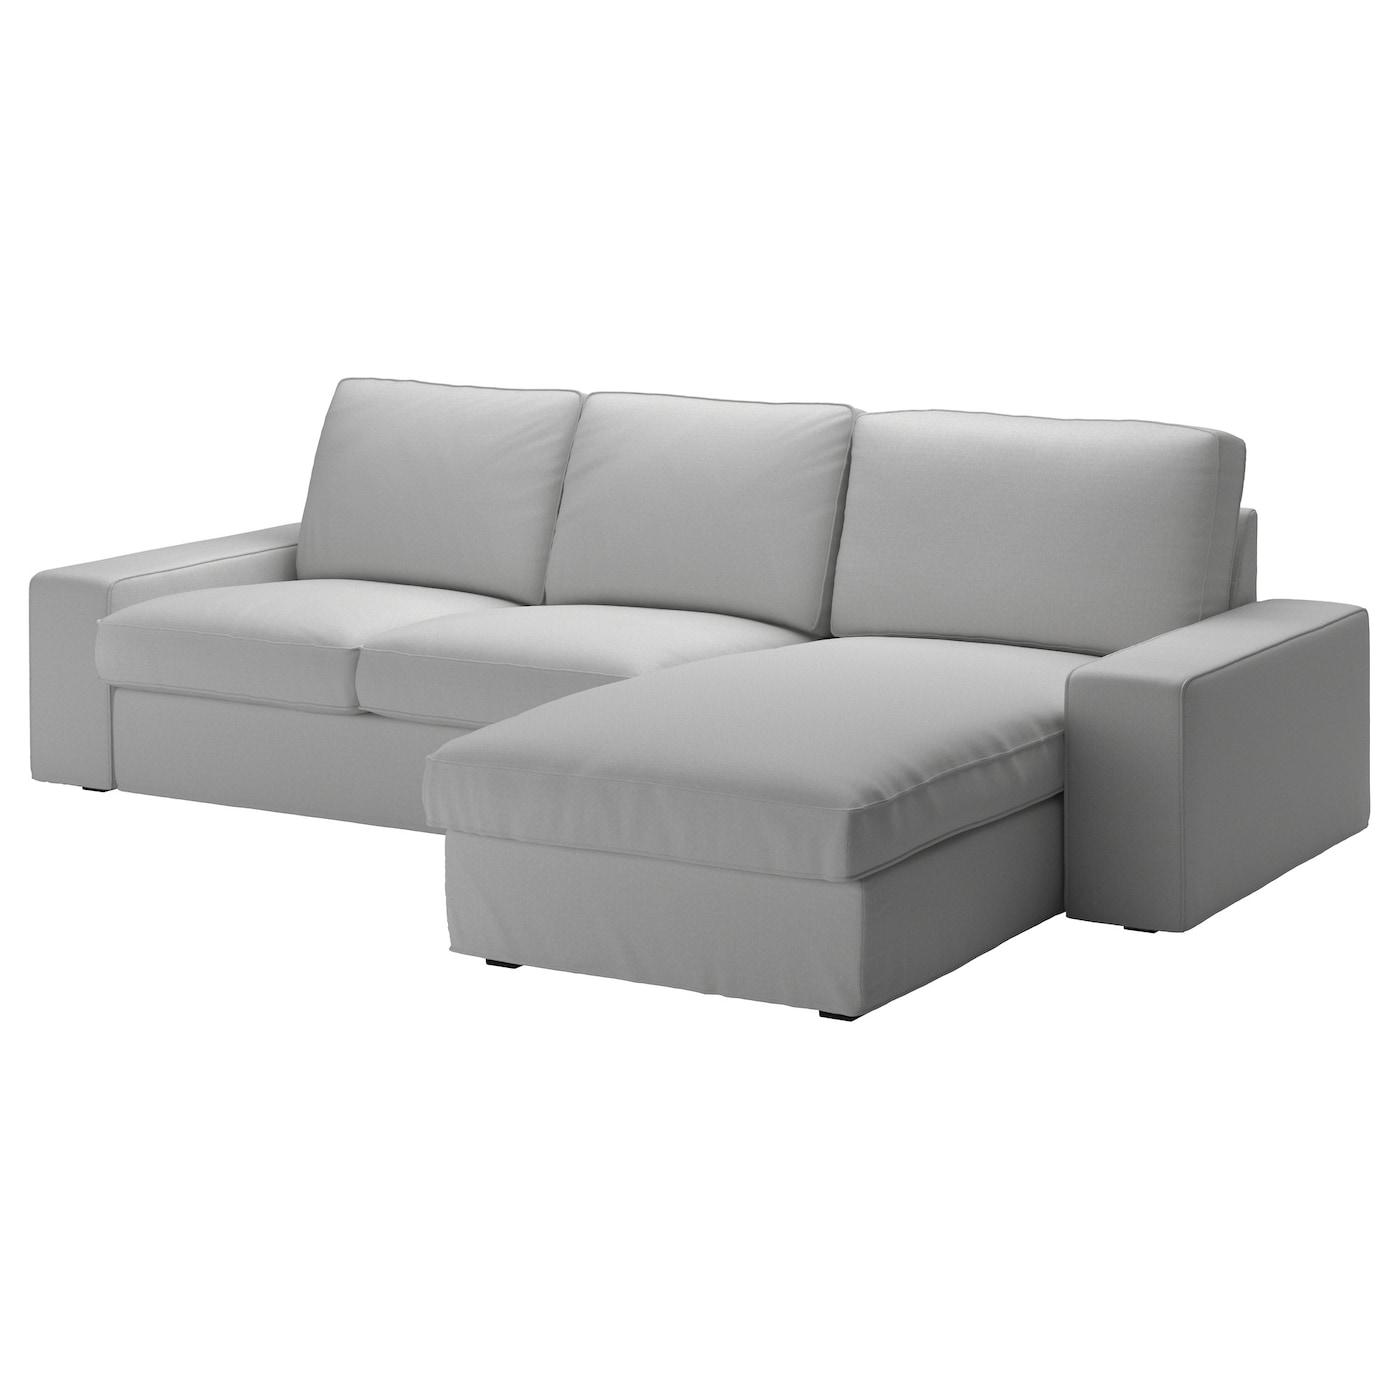 Kivik Sofa With Chaise Orrsta Light